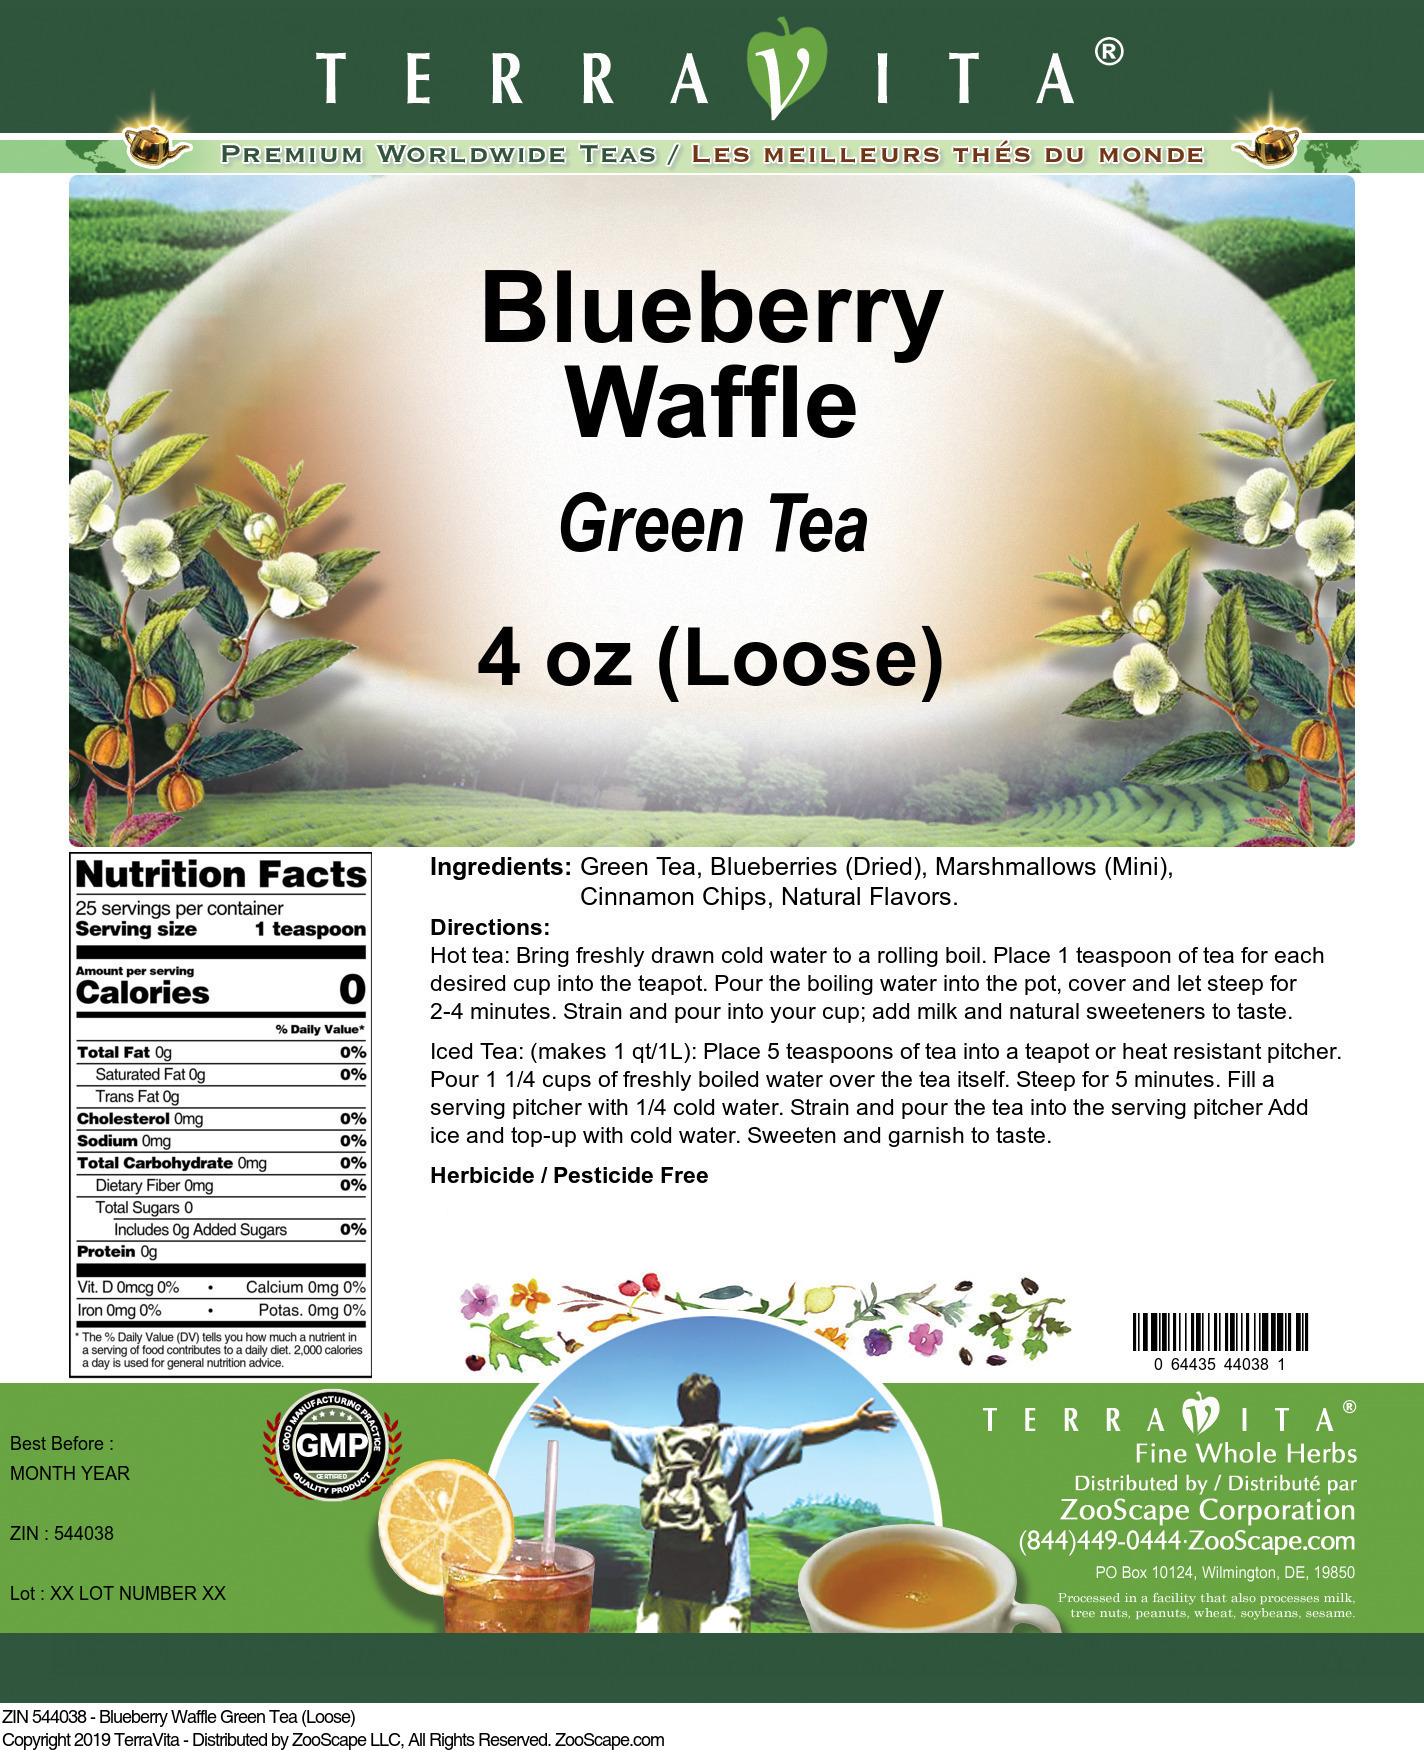 Blueberry Waffle Green Tea (Loose)